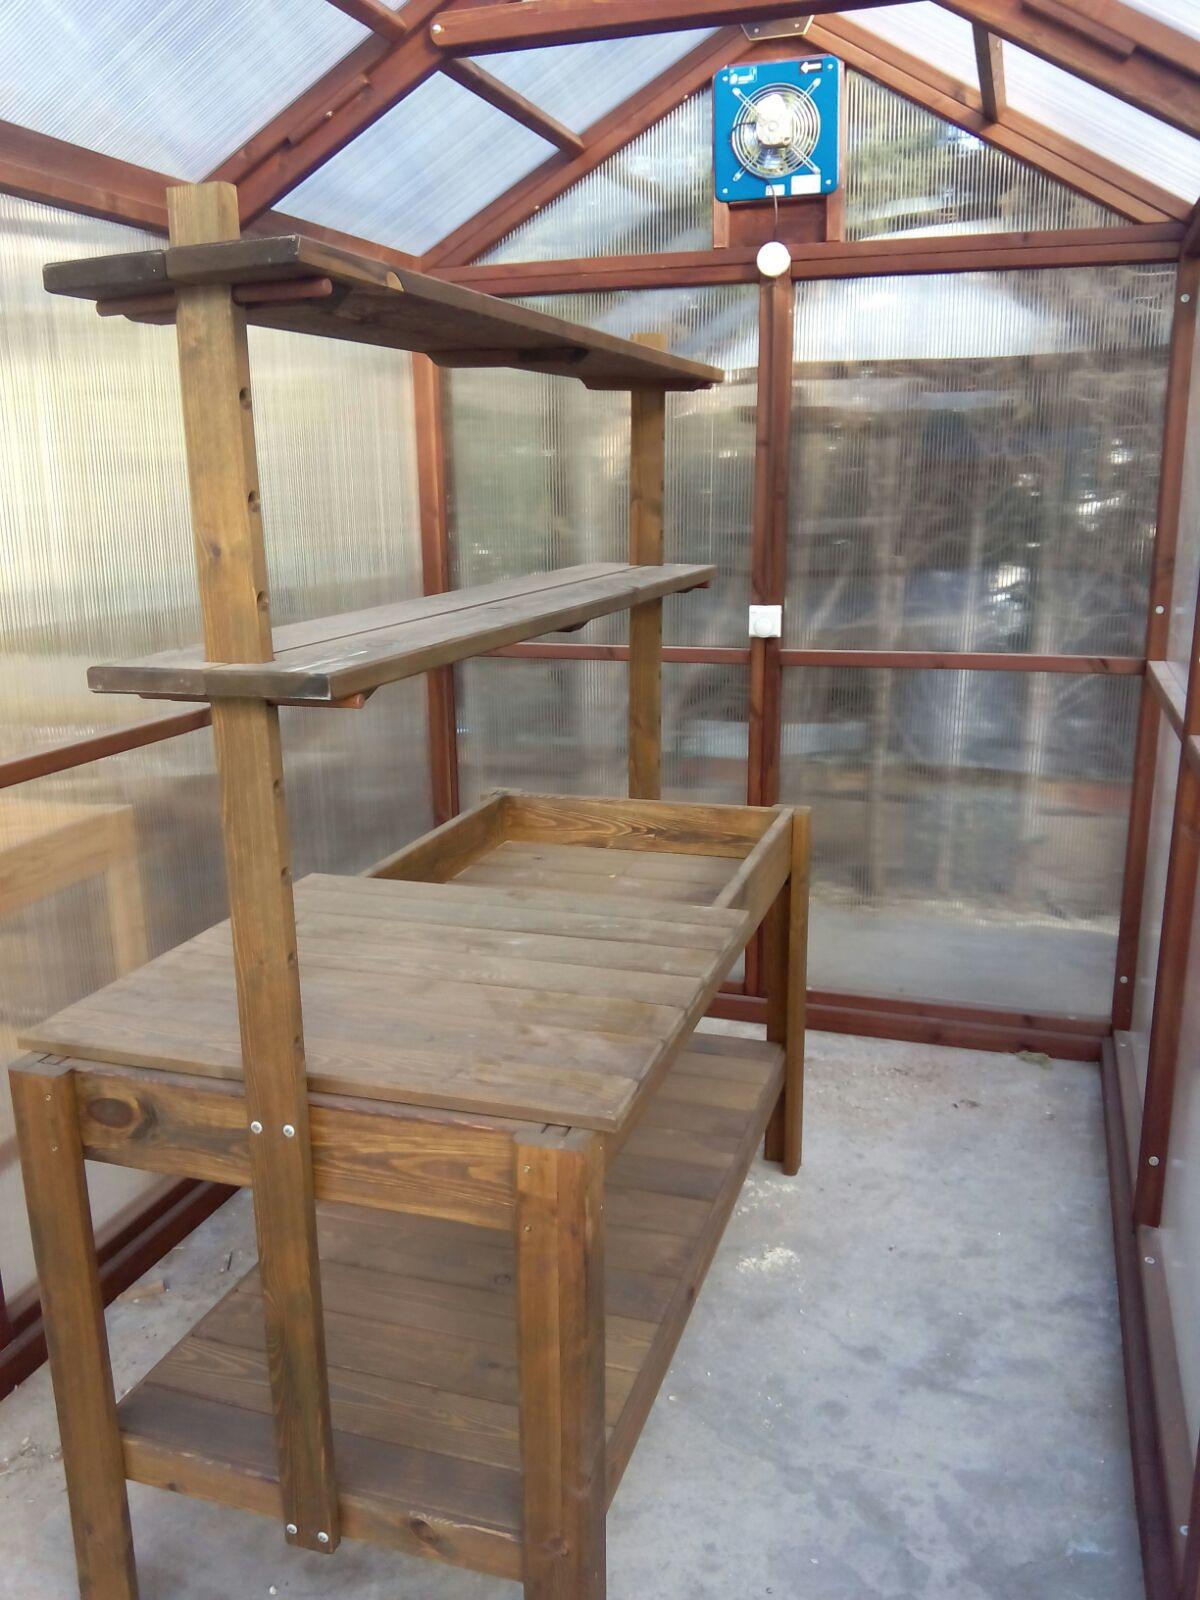 Invernadero de madera profesional  Estrucmader